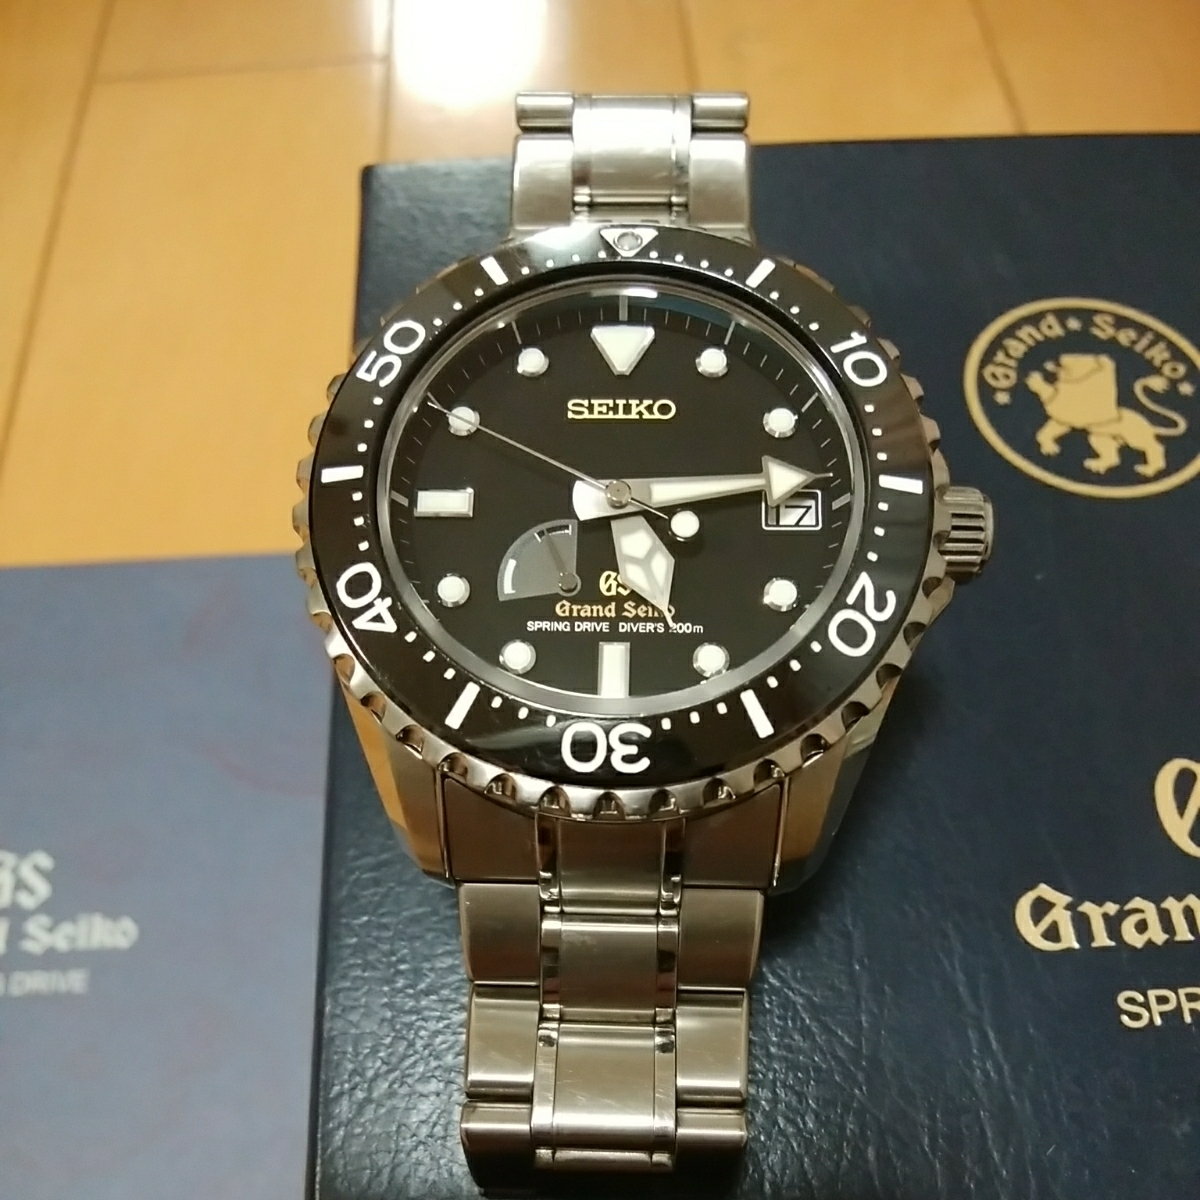 new product 08a80 66d7c 代購代標第一品牌- 樂淘letao - グランドセイコーSBGA031 ...